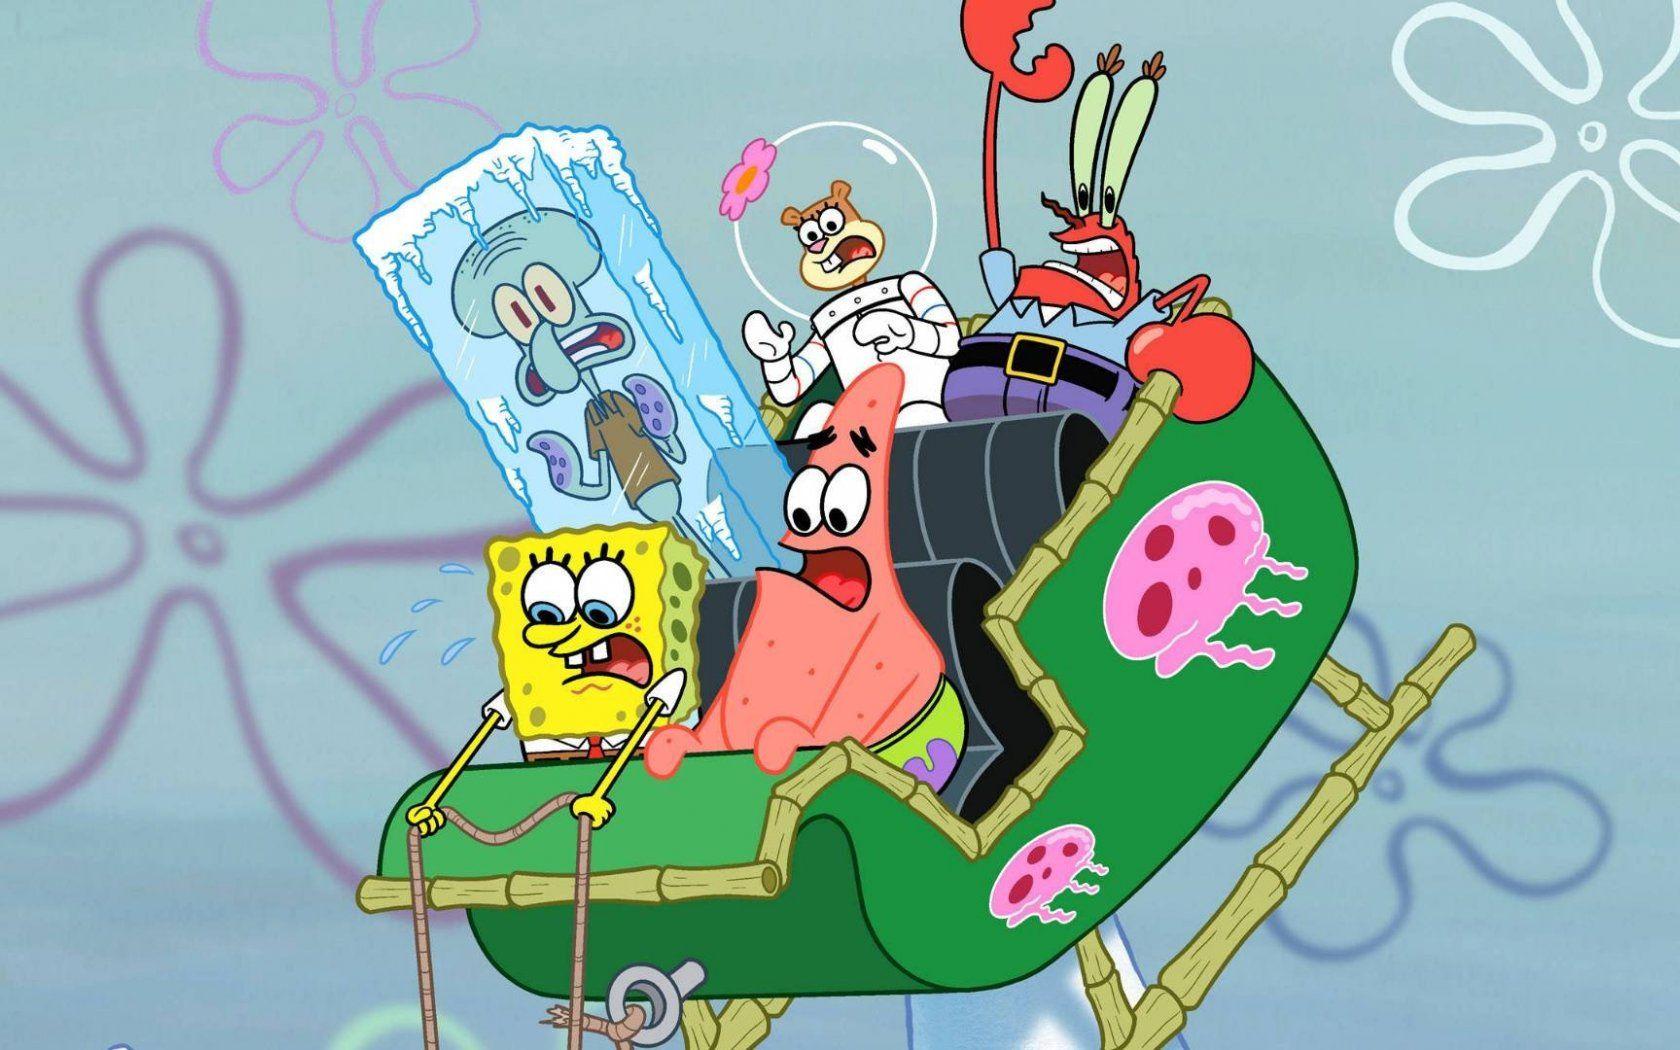 Mr krabs patrick star sandy cheeks spongebob squarepants